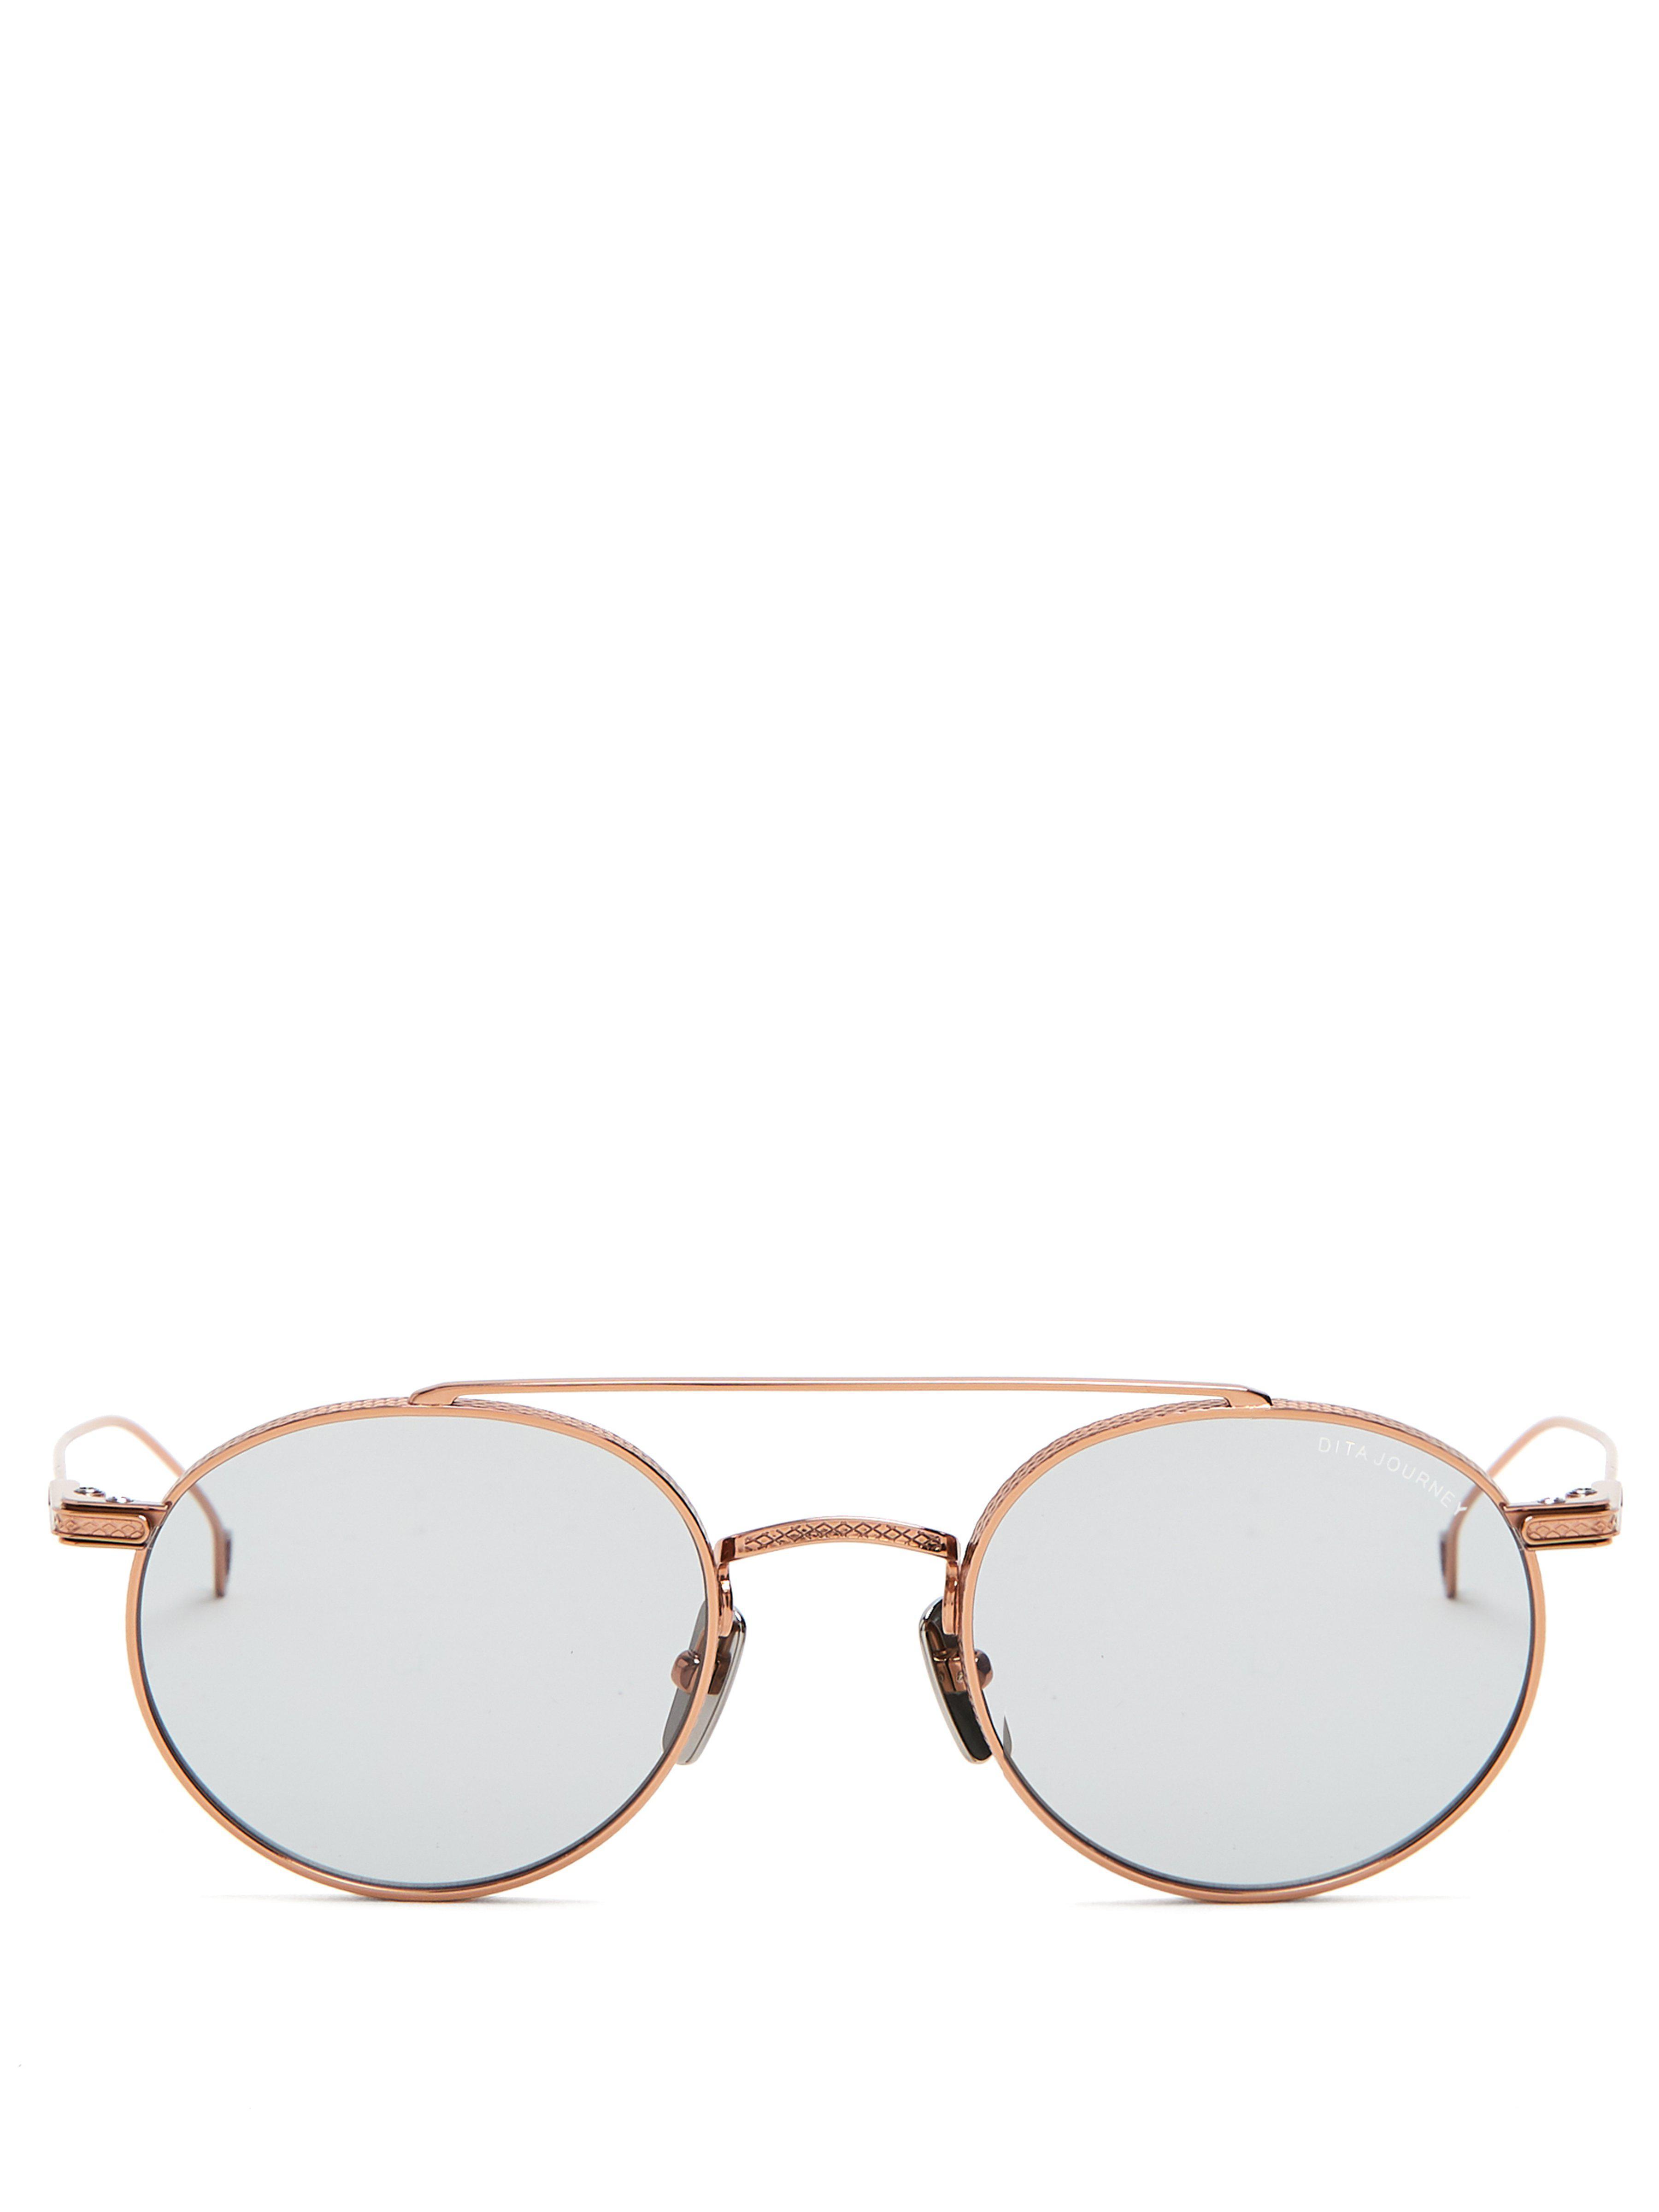 0d5fd80919c Dita Eyewear Journey Round Frame Sunglasses in Metallic for Men - Lyst